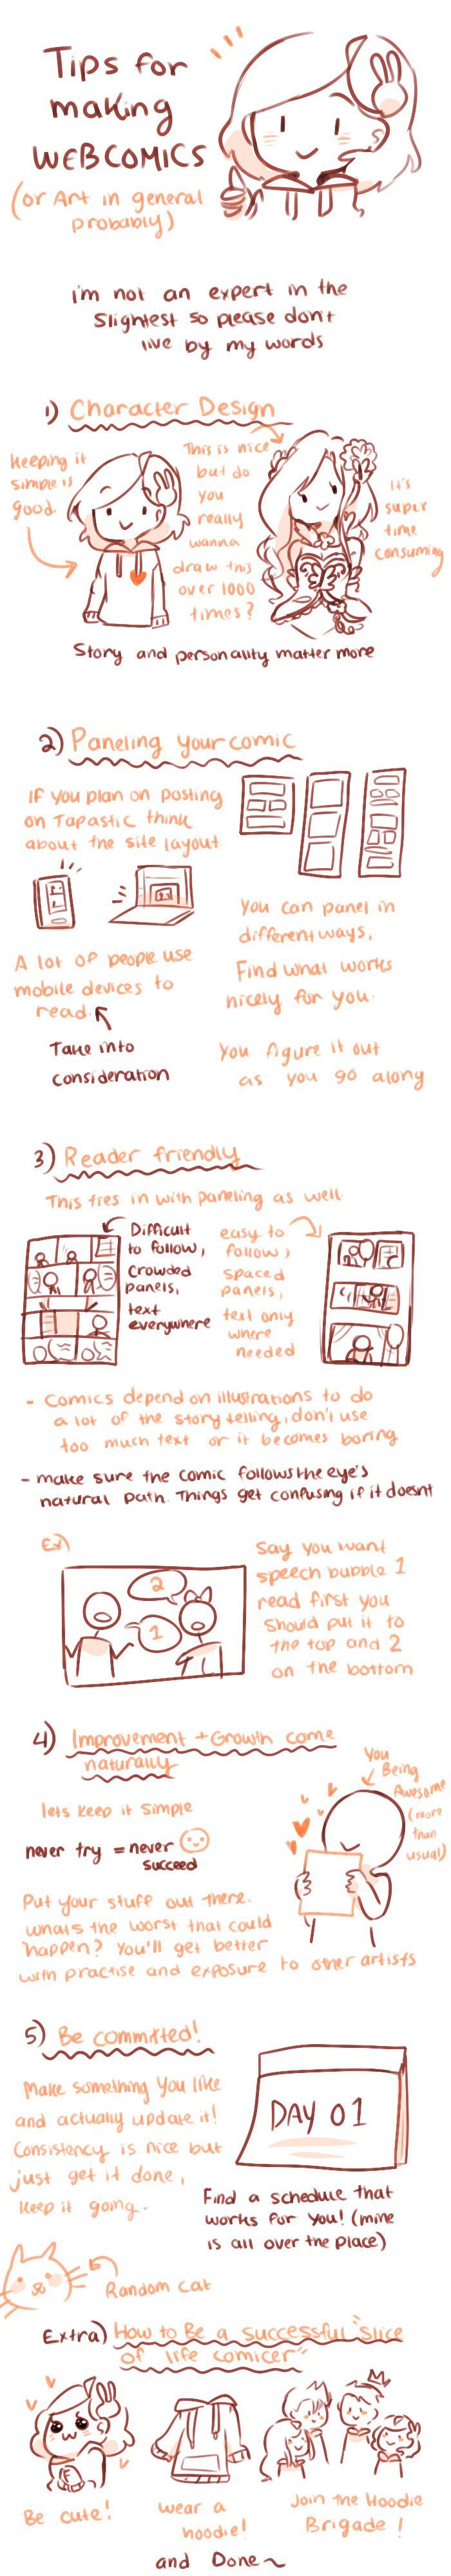 Anti-Social Media :: Extra: Tips that may be helpful | Tapastic Comics - image 1